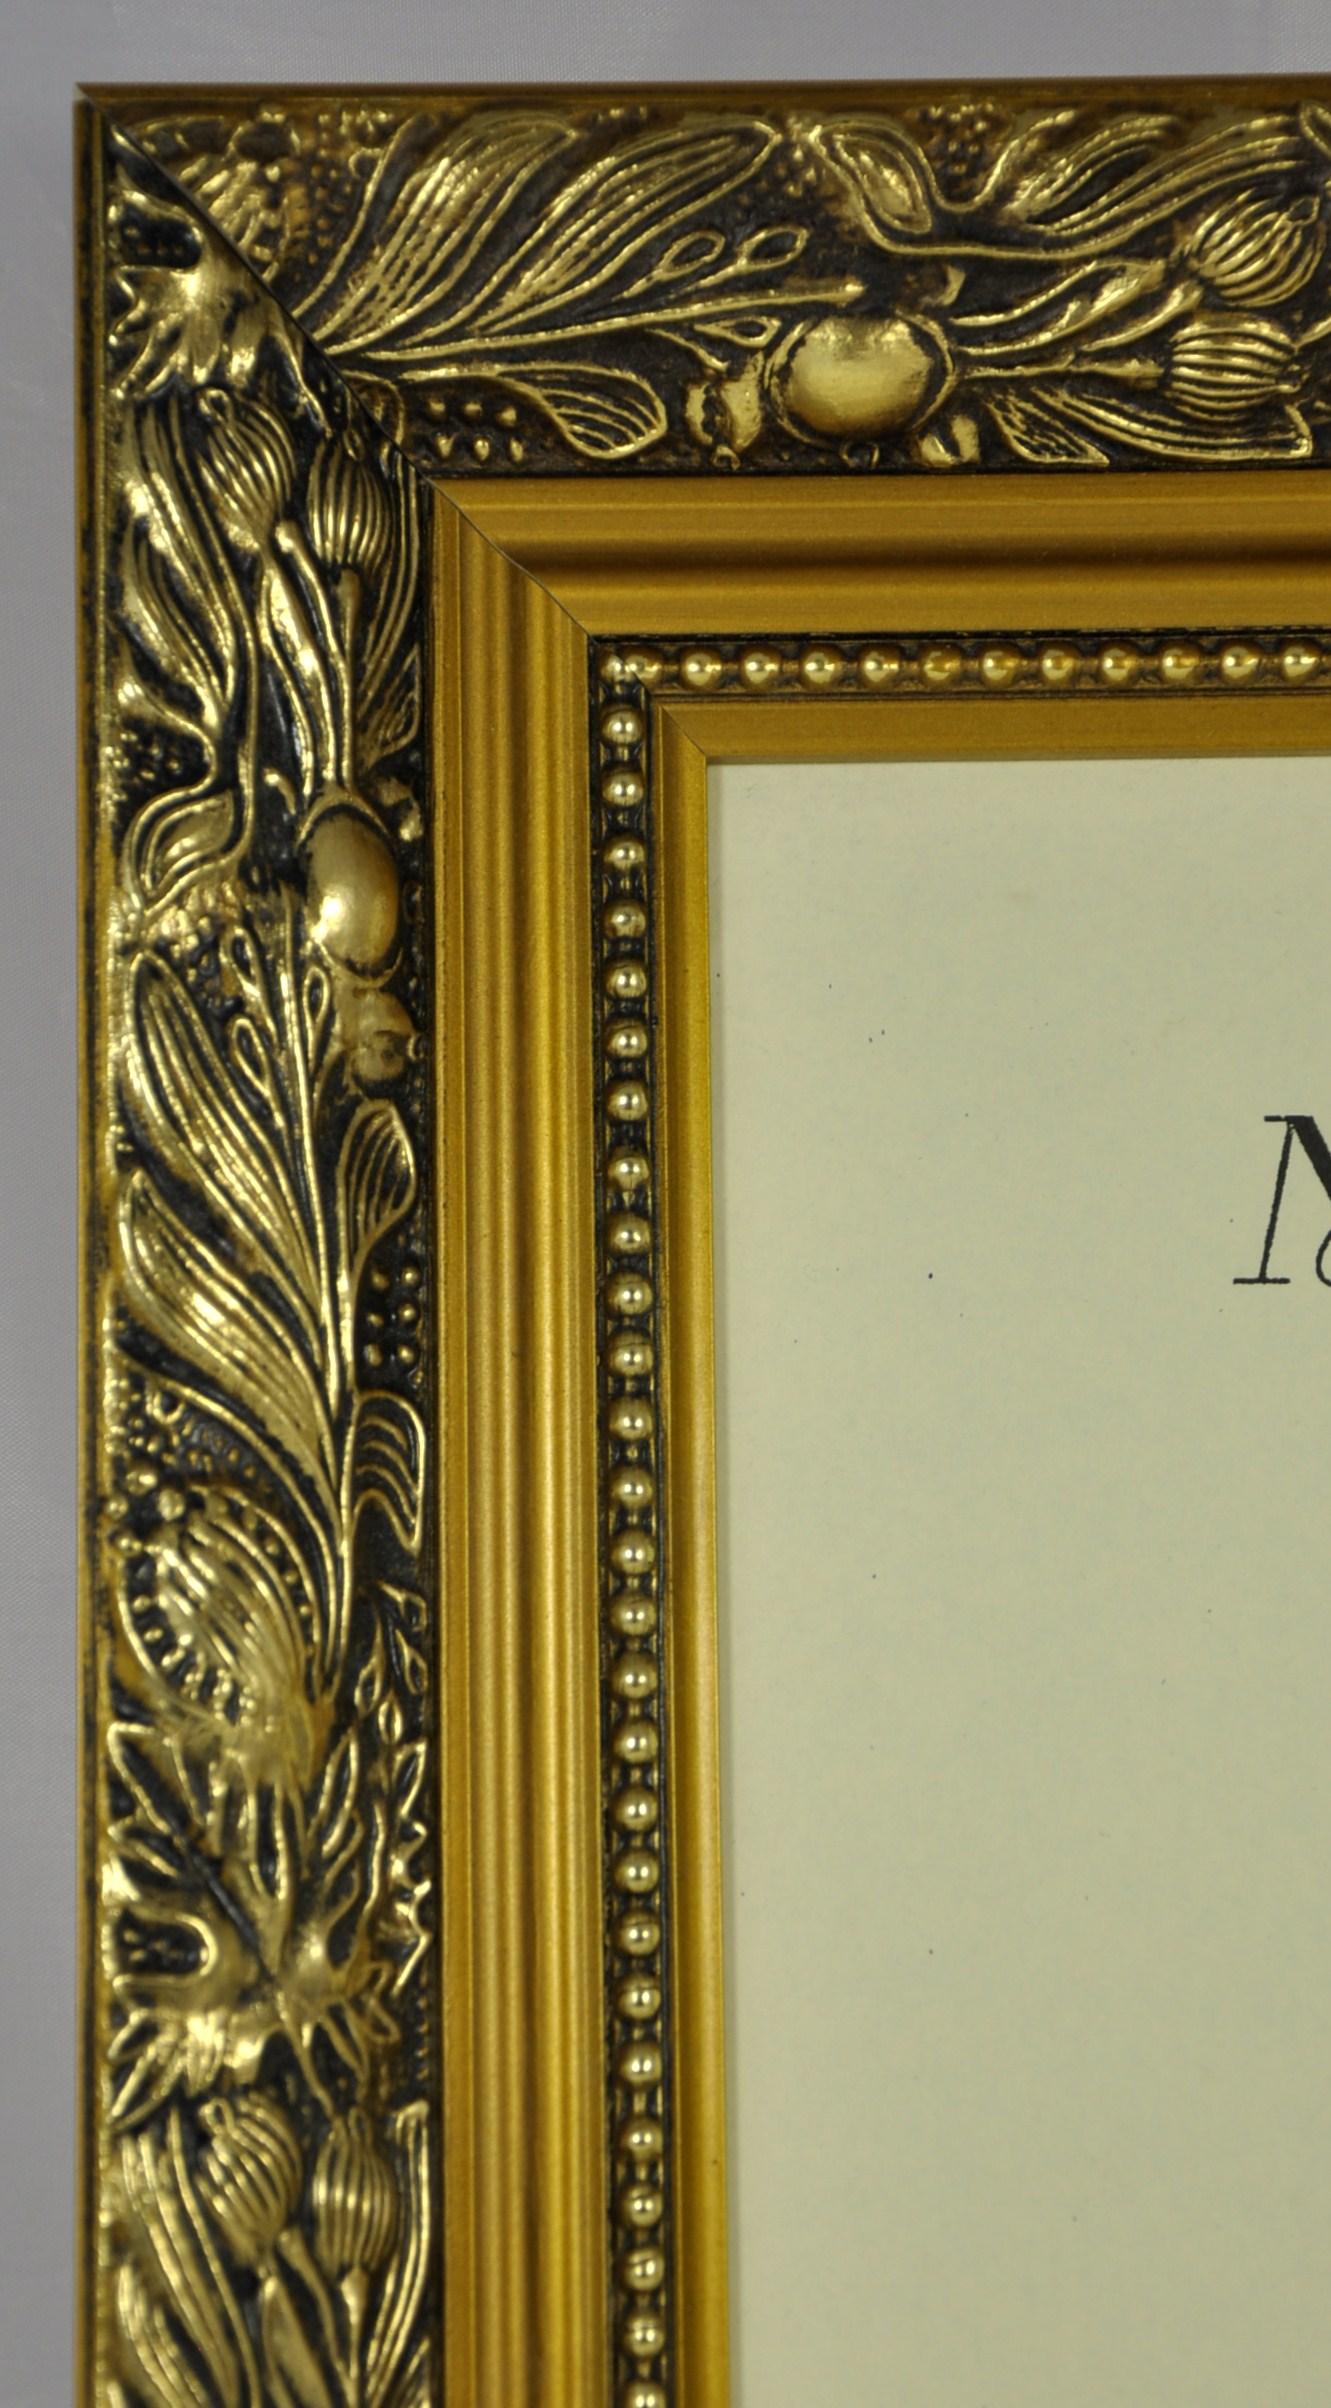 f4 quality wood frame in gold dahlia trade picture frames. Black Bedroom Furniture Sets. Home Design Ideas